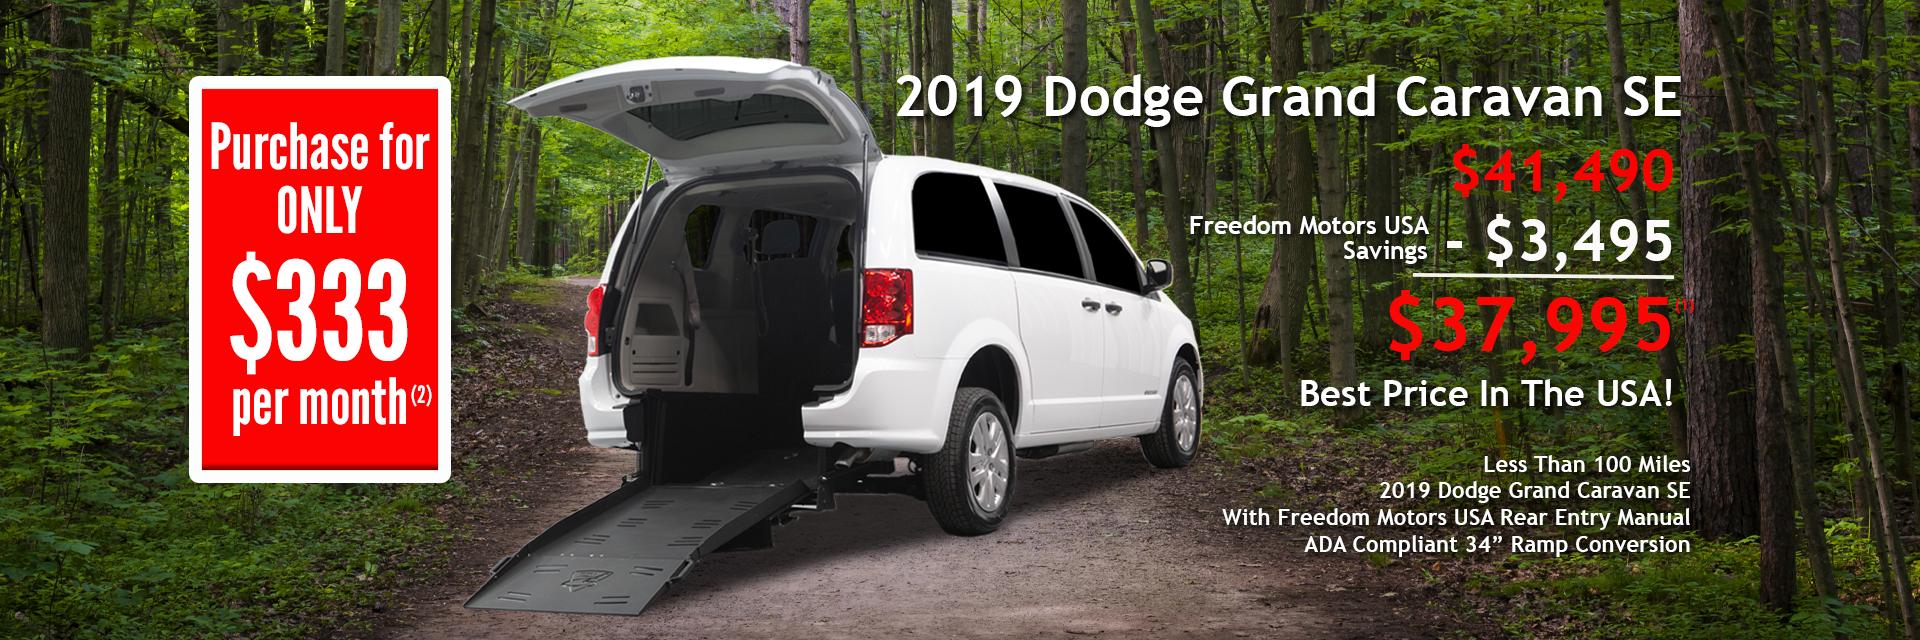 On Sale Rear Entry Dodge Caravan 2019